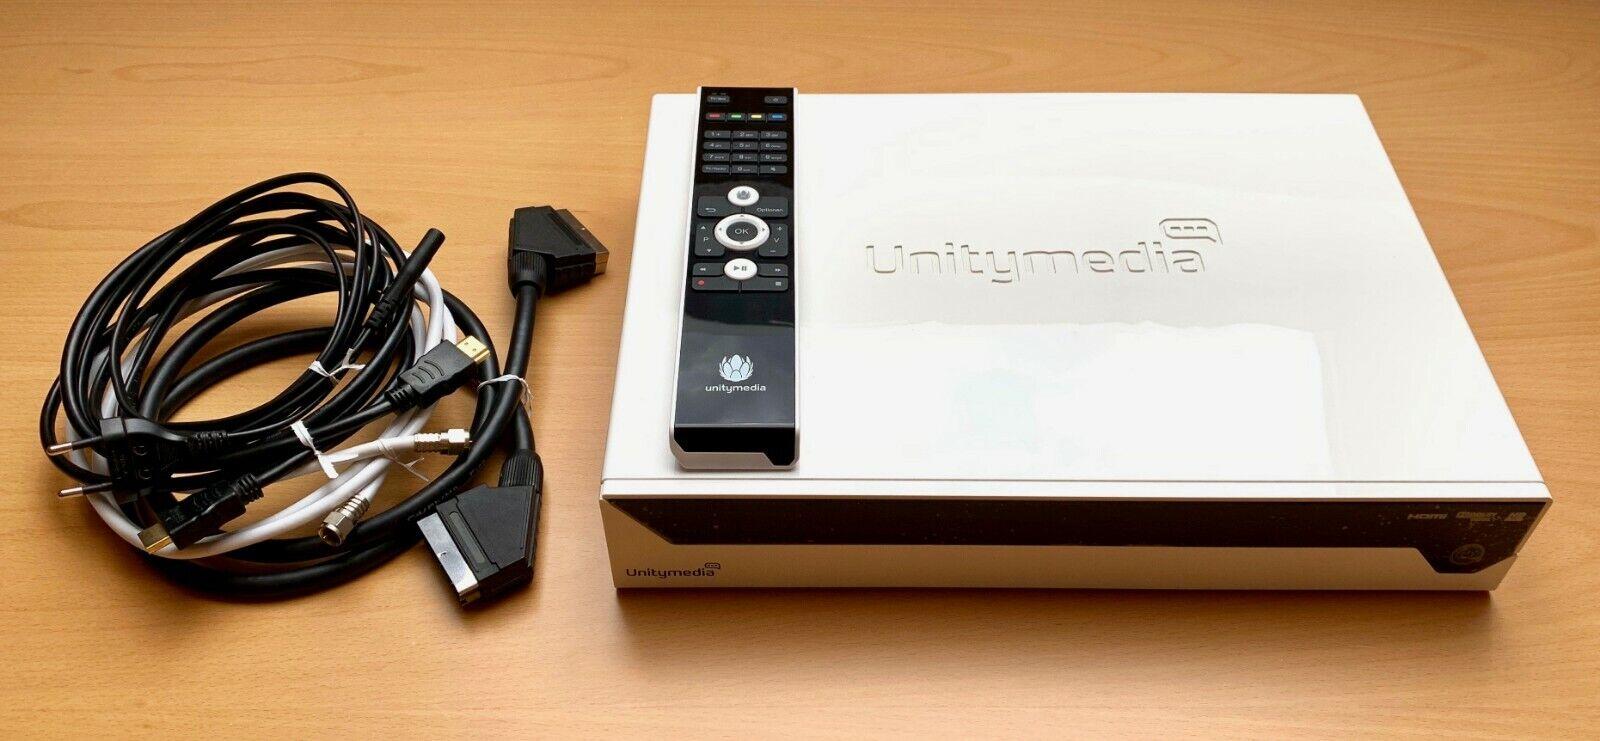 Unitymedia Echostar HDC-601DER-REV A5 HD Kabelreceiver mit 500 GB Festplatte